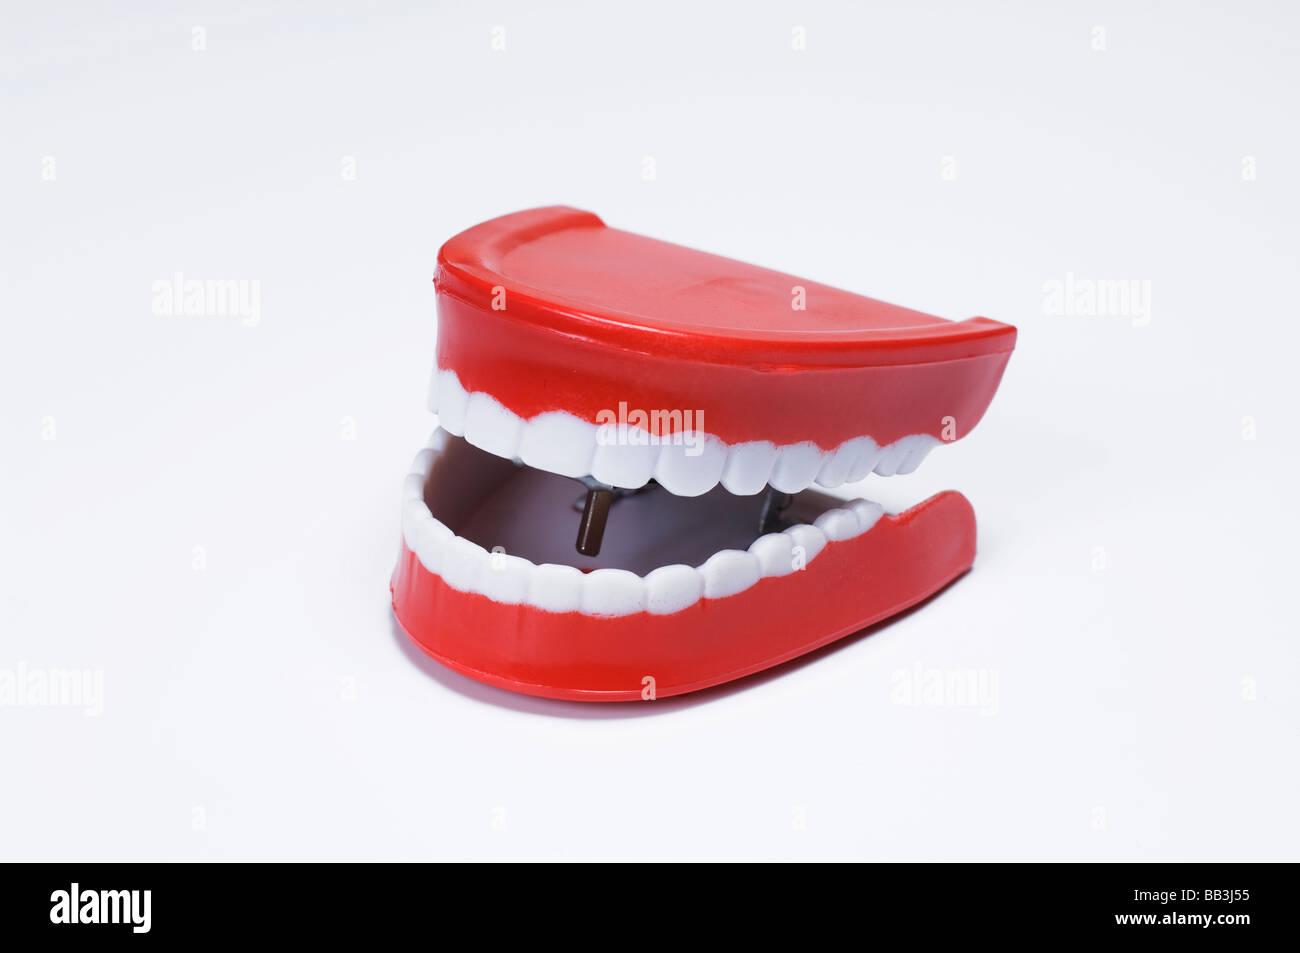 Joke false teeth - Stock Image